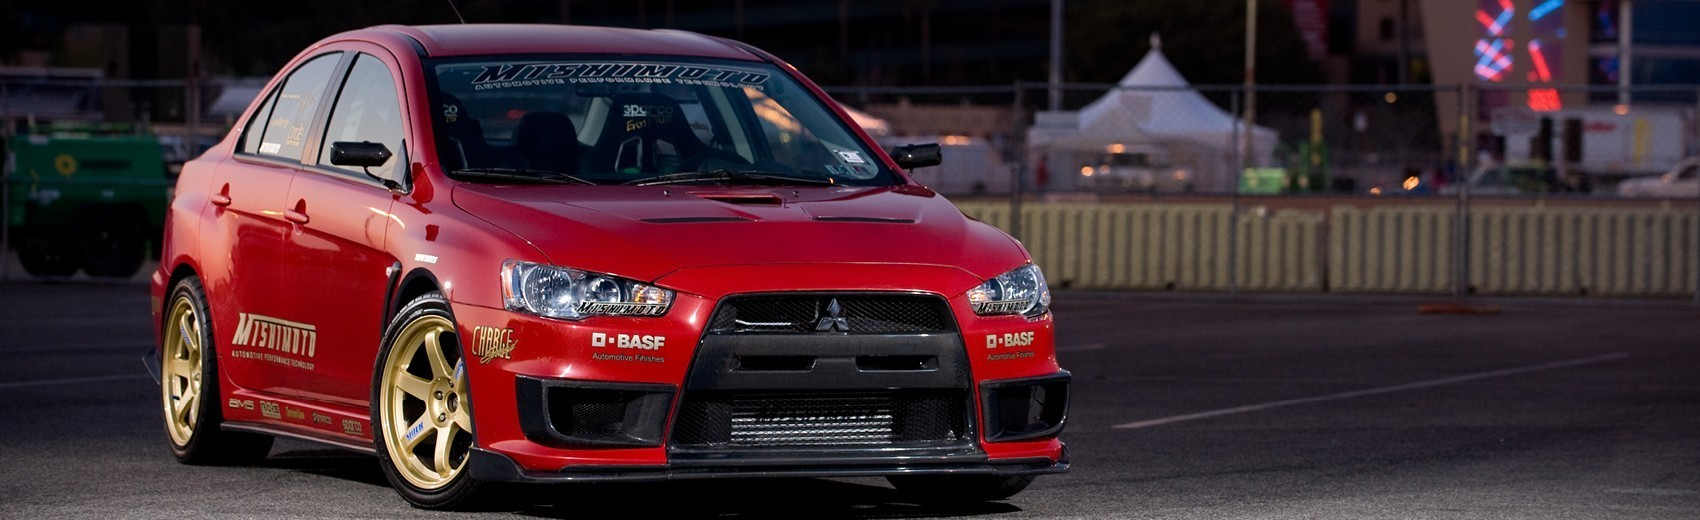 Mitsubishi Lancer Evolution Performance Parts